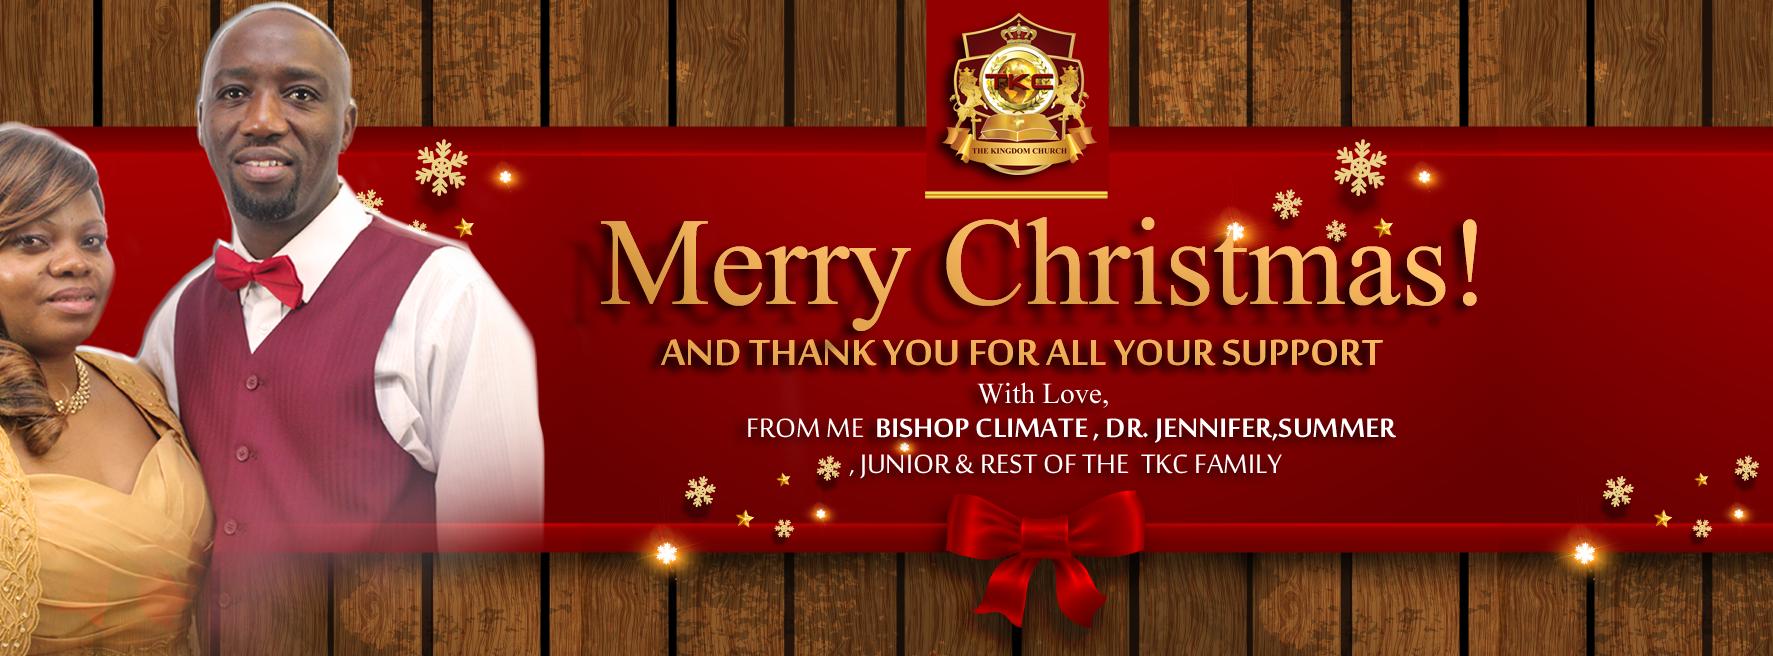 Merry Christmas TKC